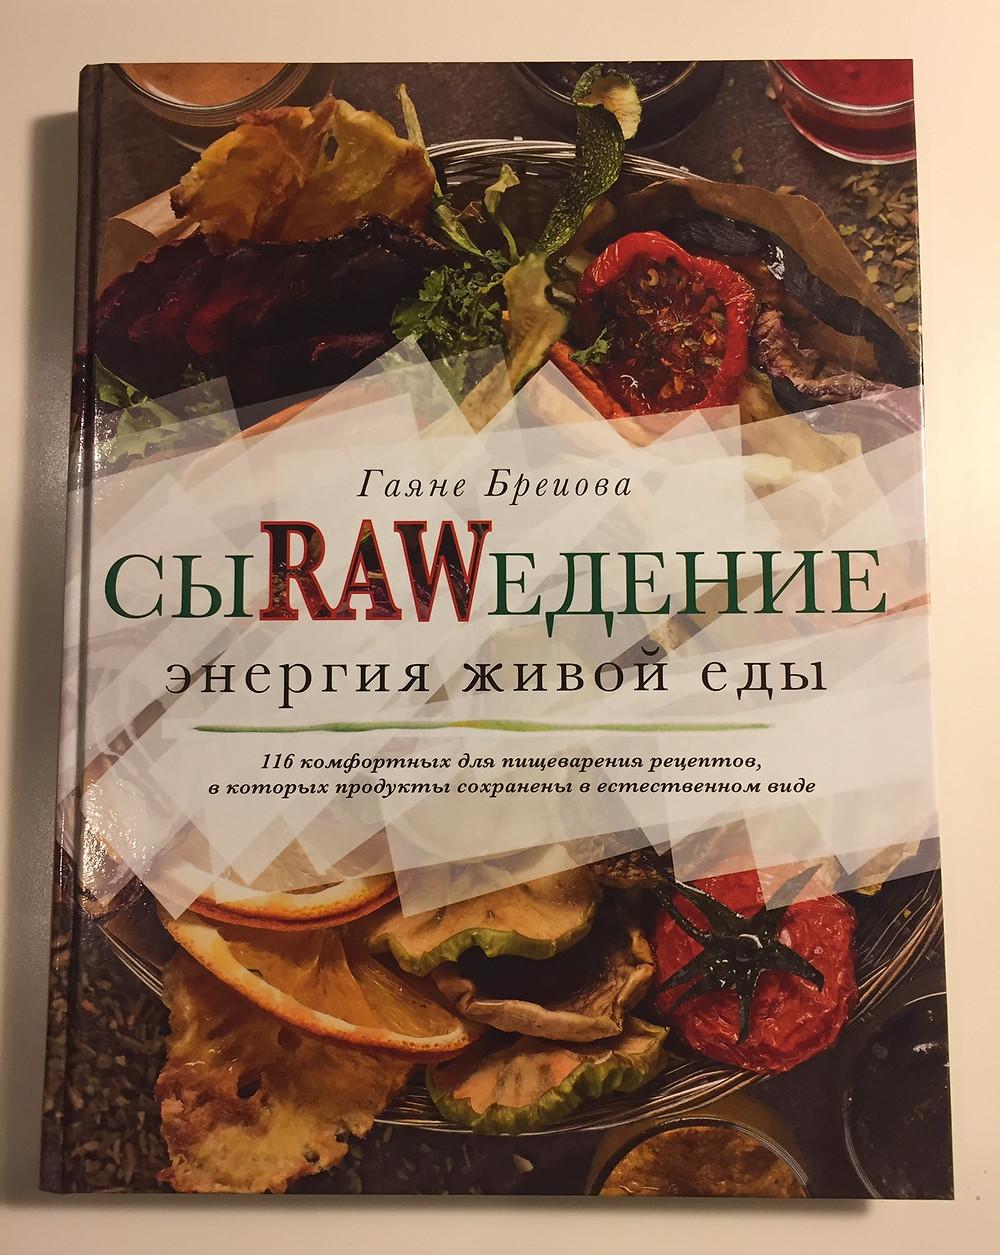 рецепты сырого меню гаяне бреиовой